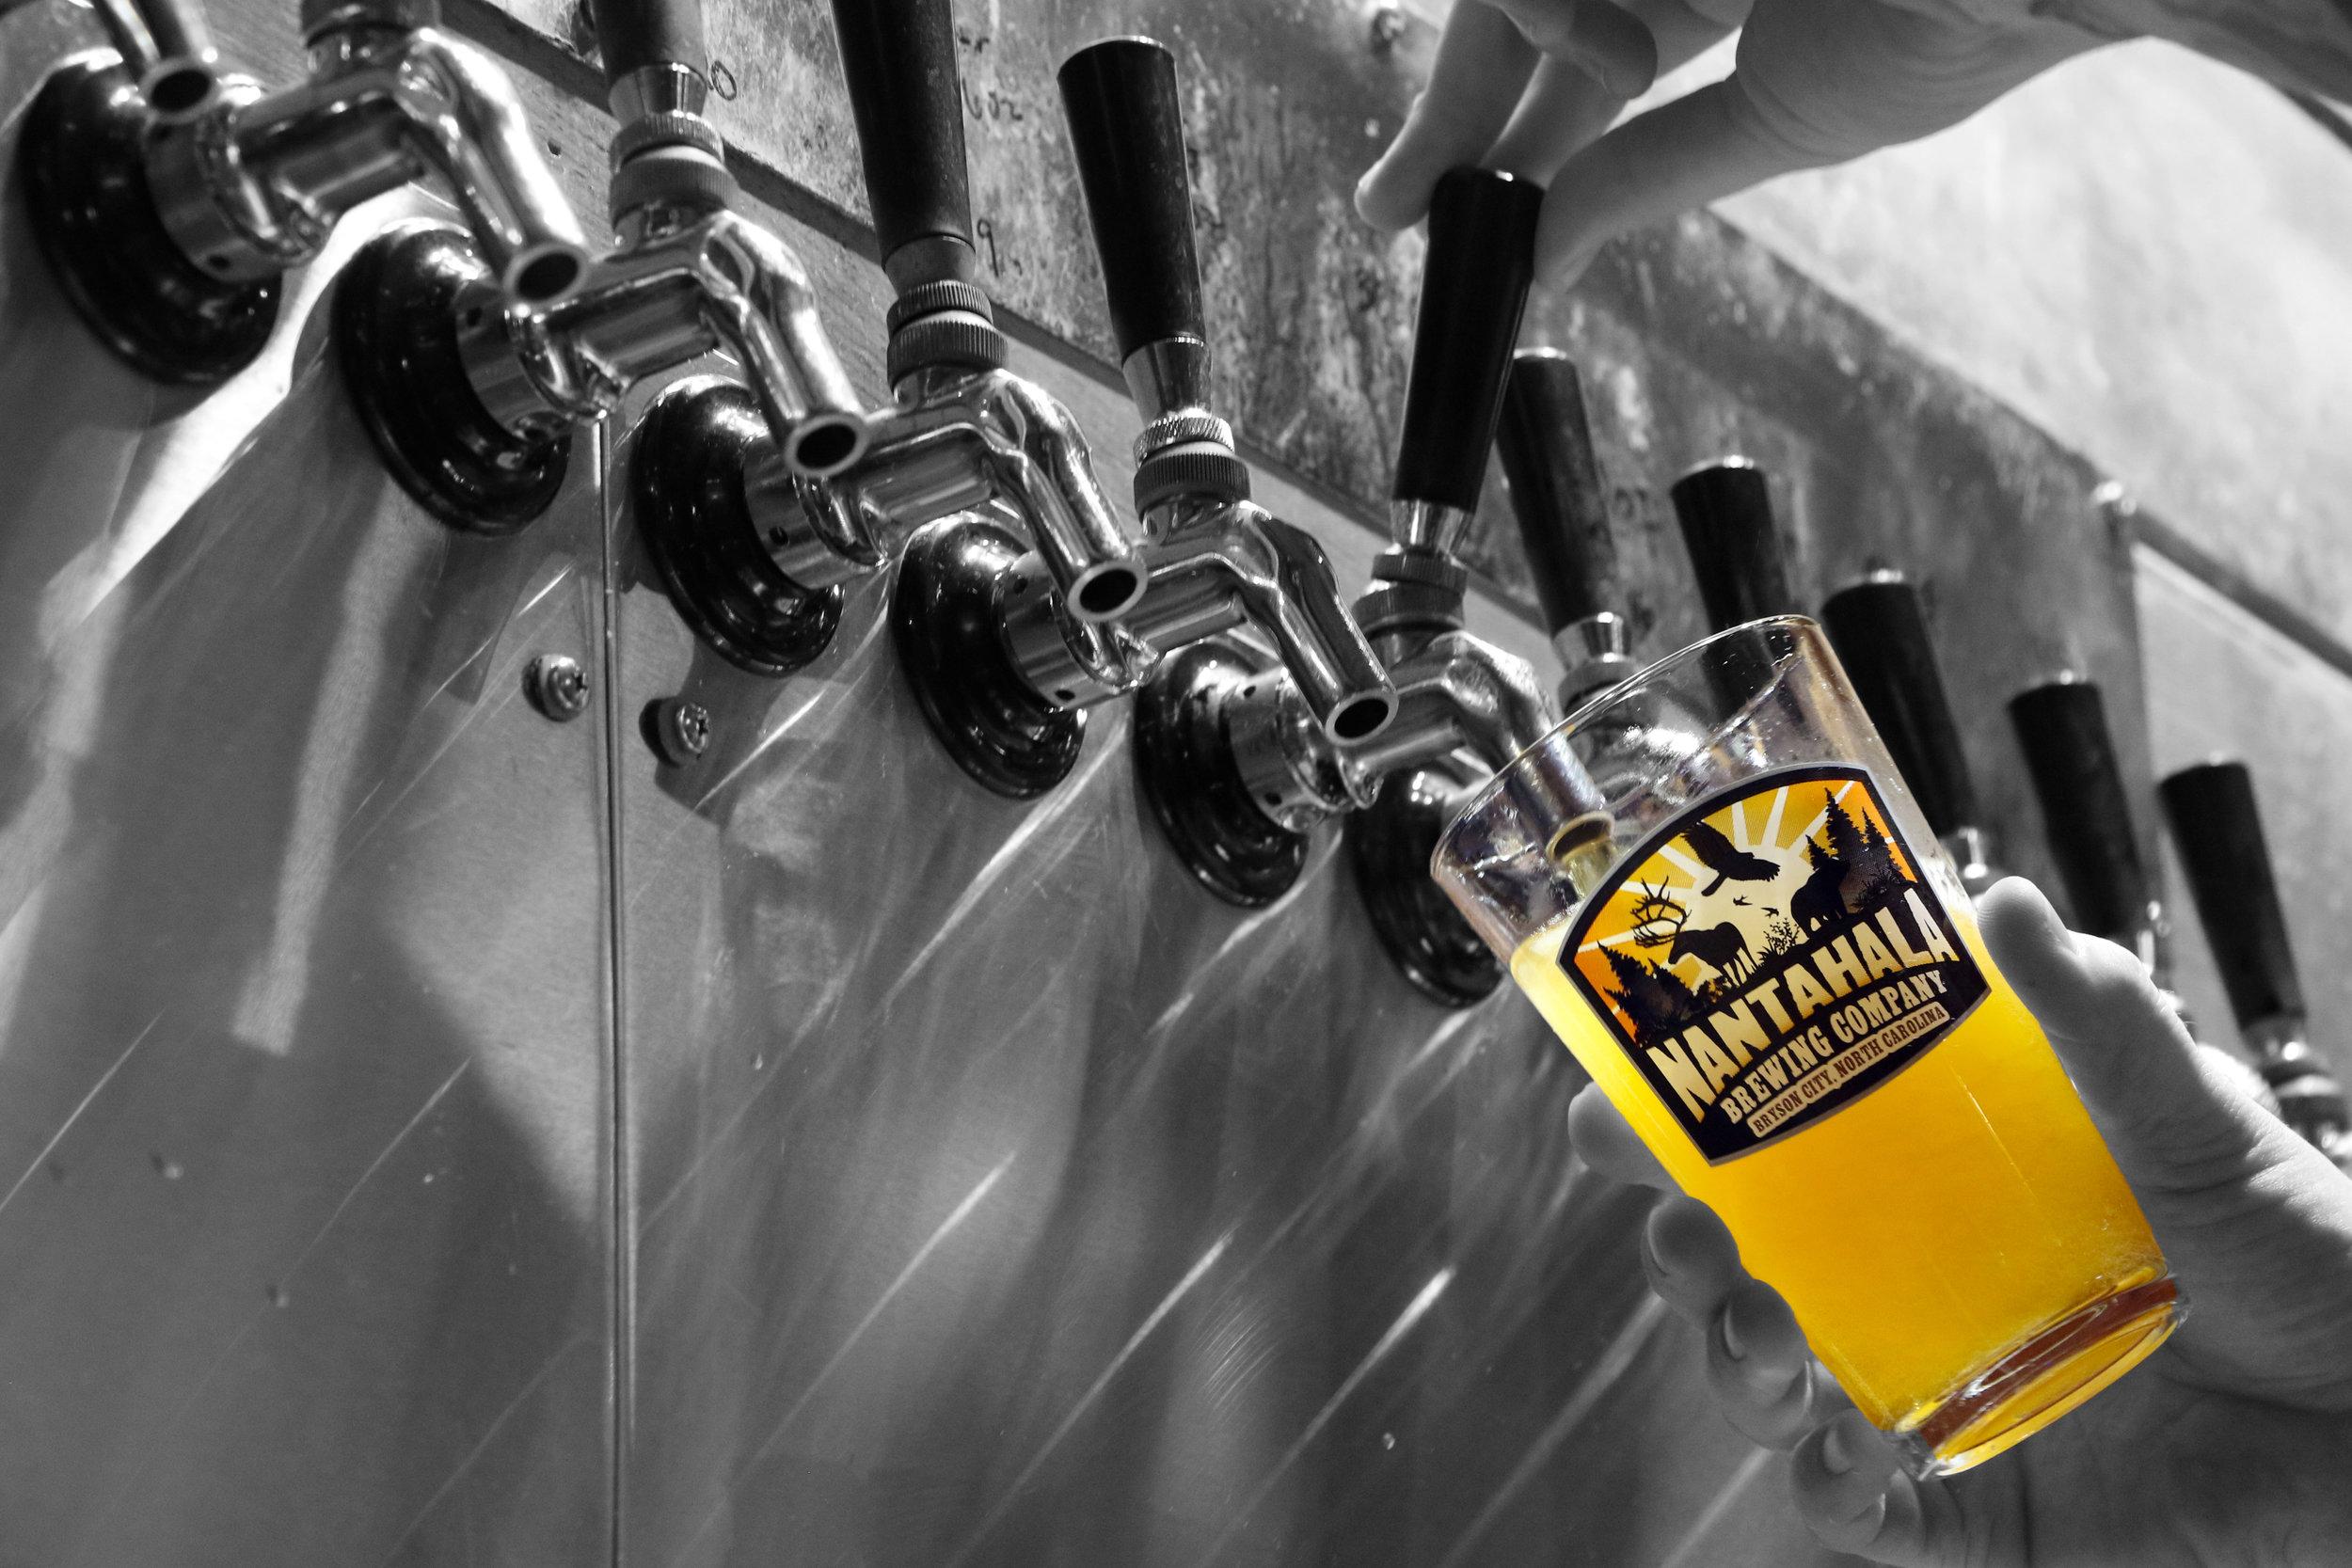 nantahala-brewing-company-taproom-taps-pour.jpg